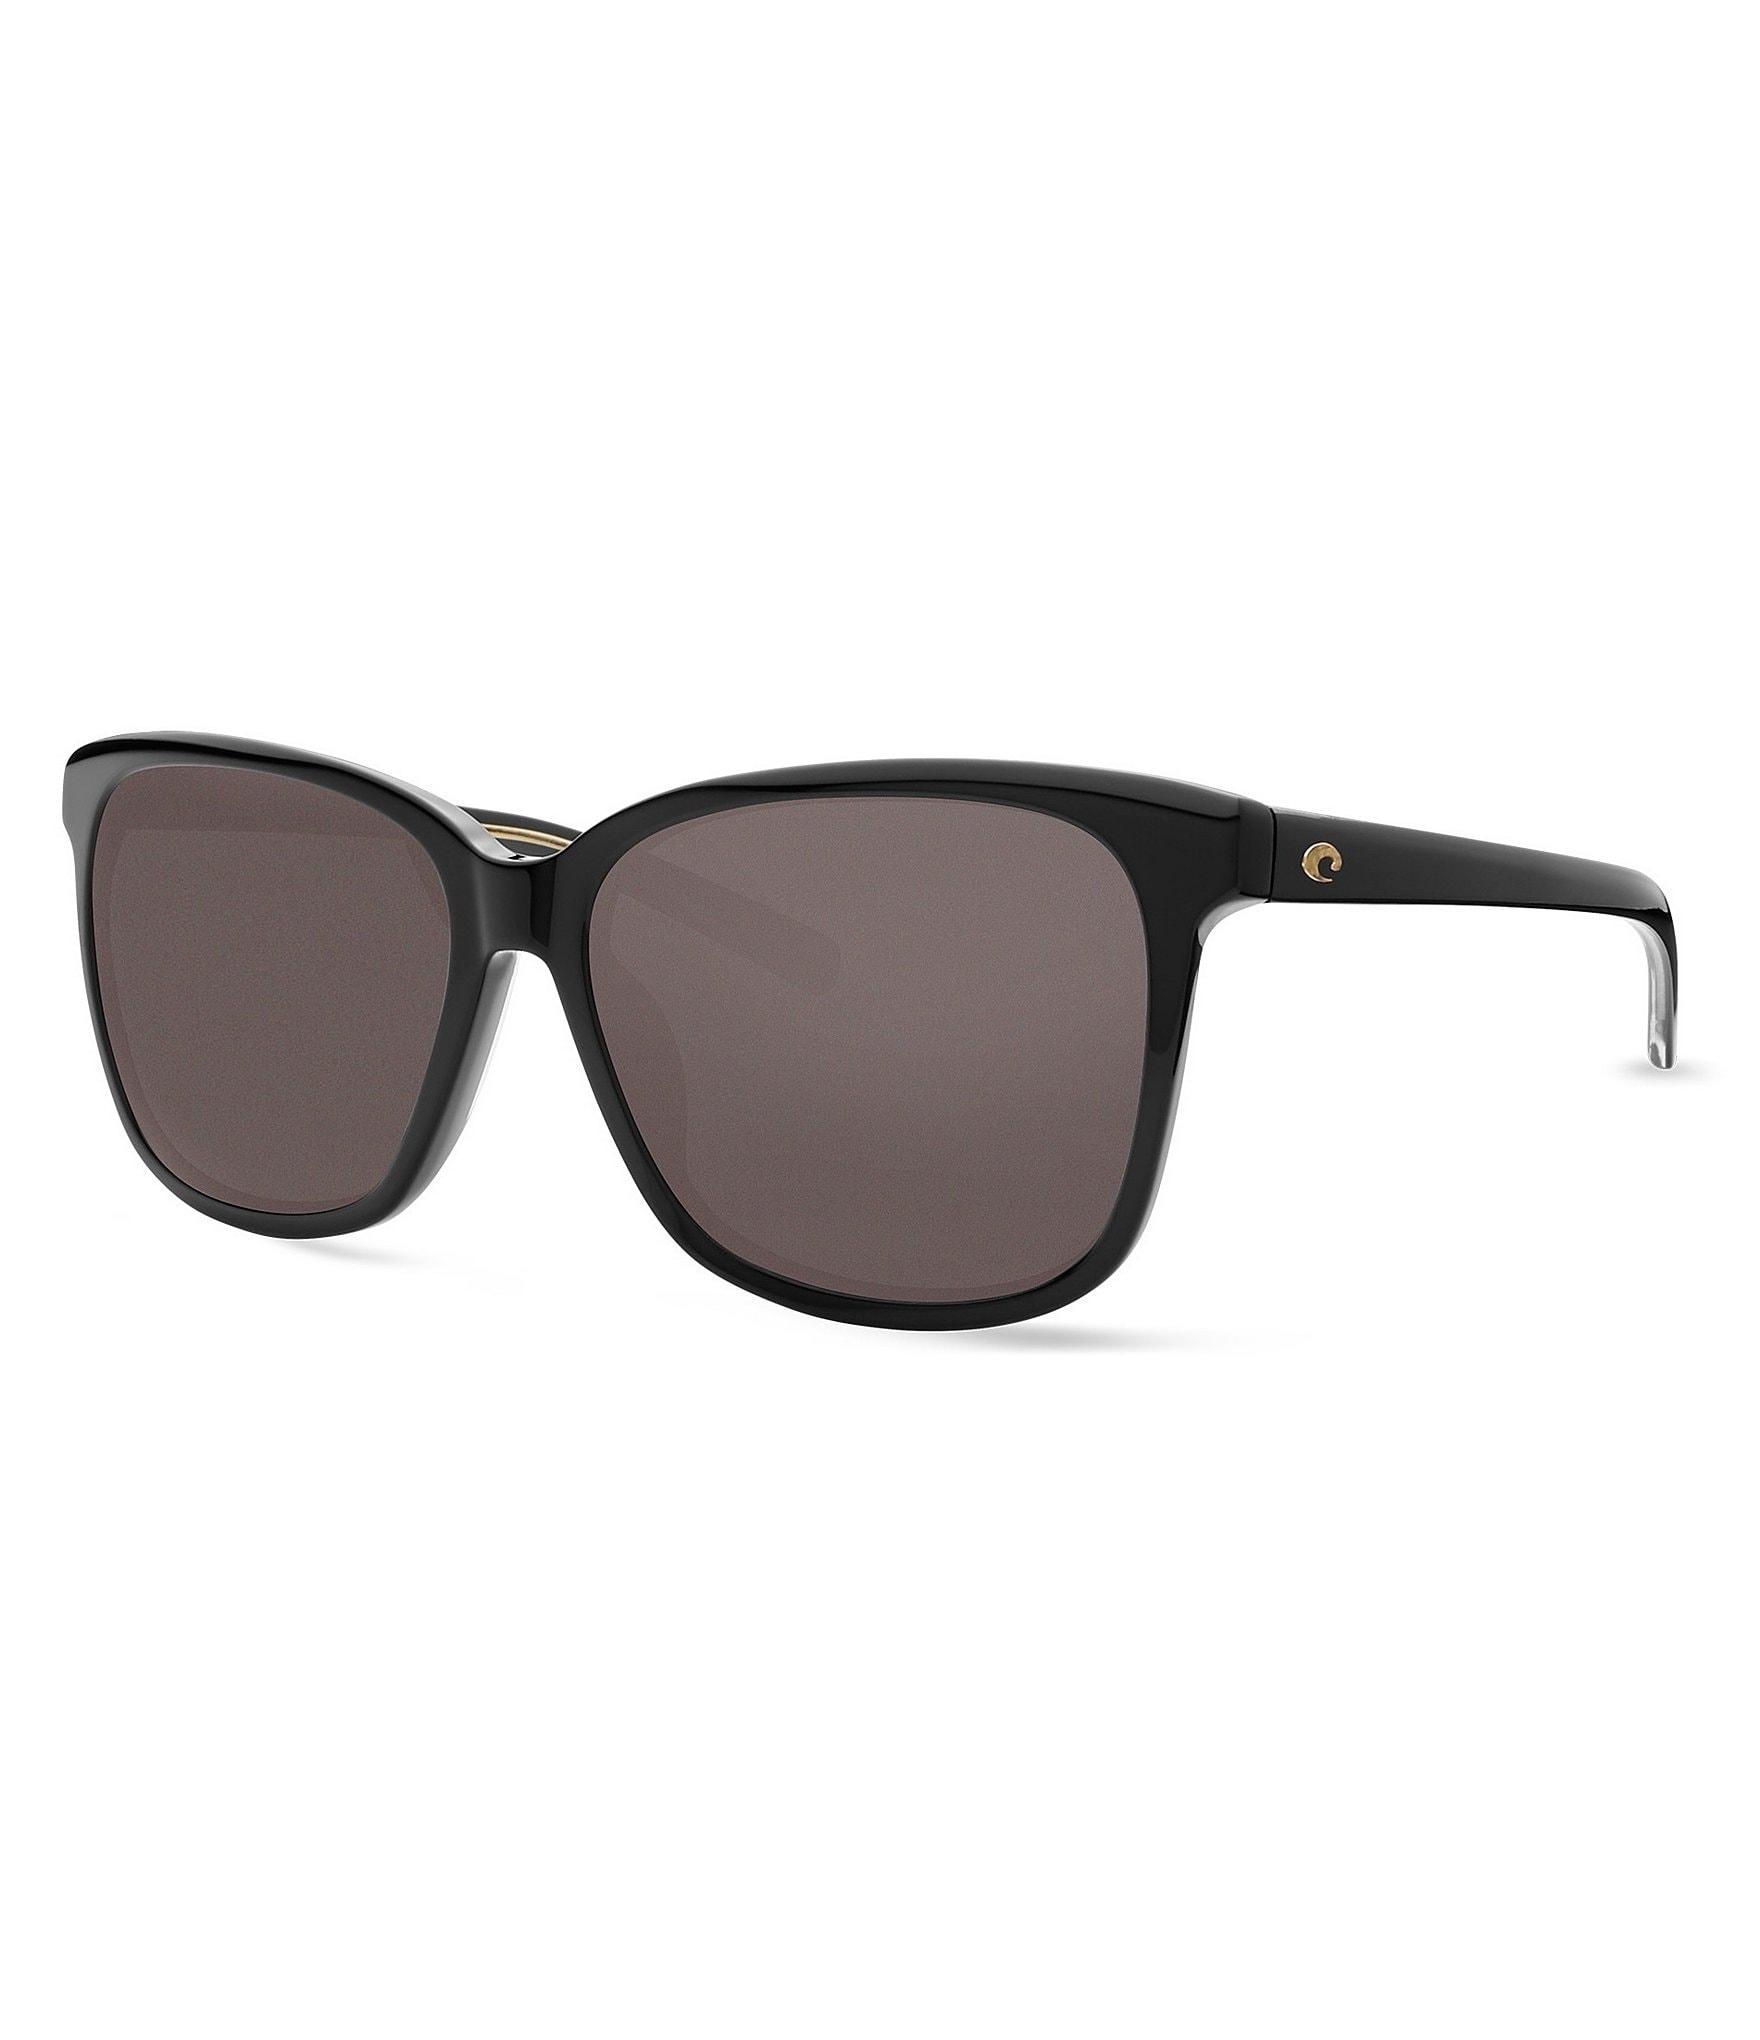 60405fb01a Costa May Polarized Sunglasses